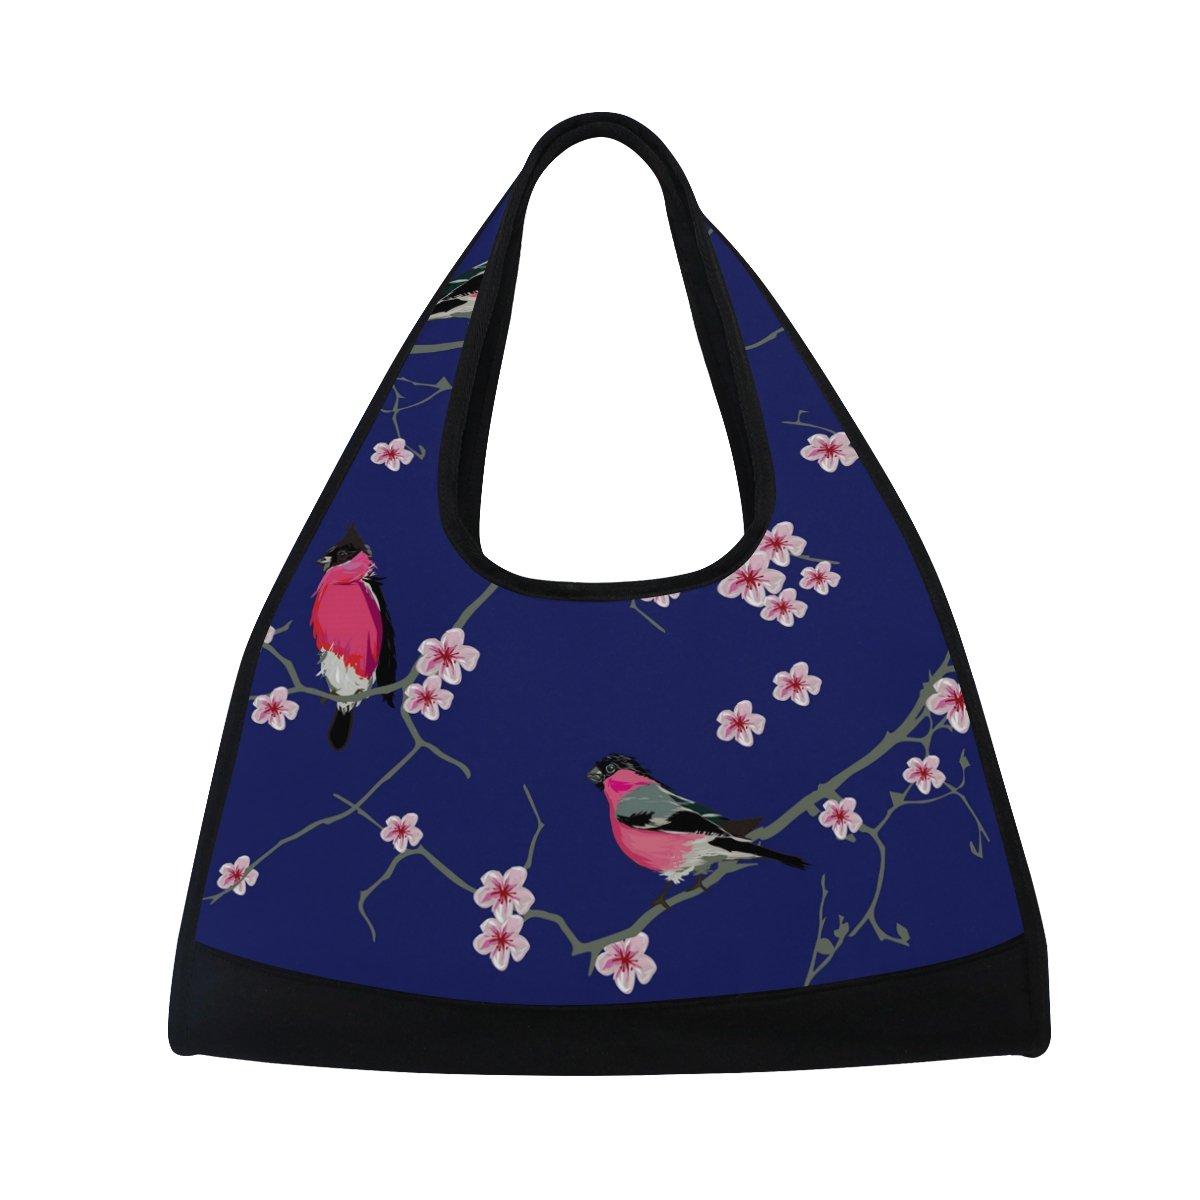 AHOMY Canvas Sports Gym Bag Branches Bird Travel Shoulder Bag